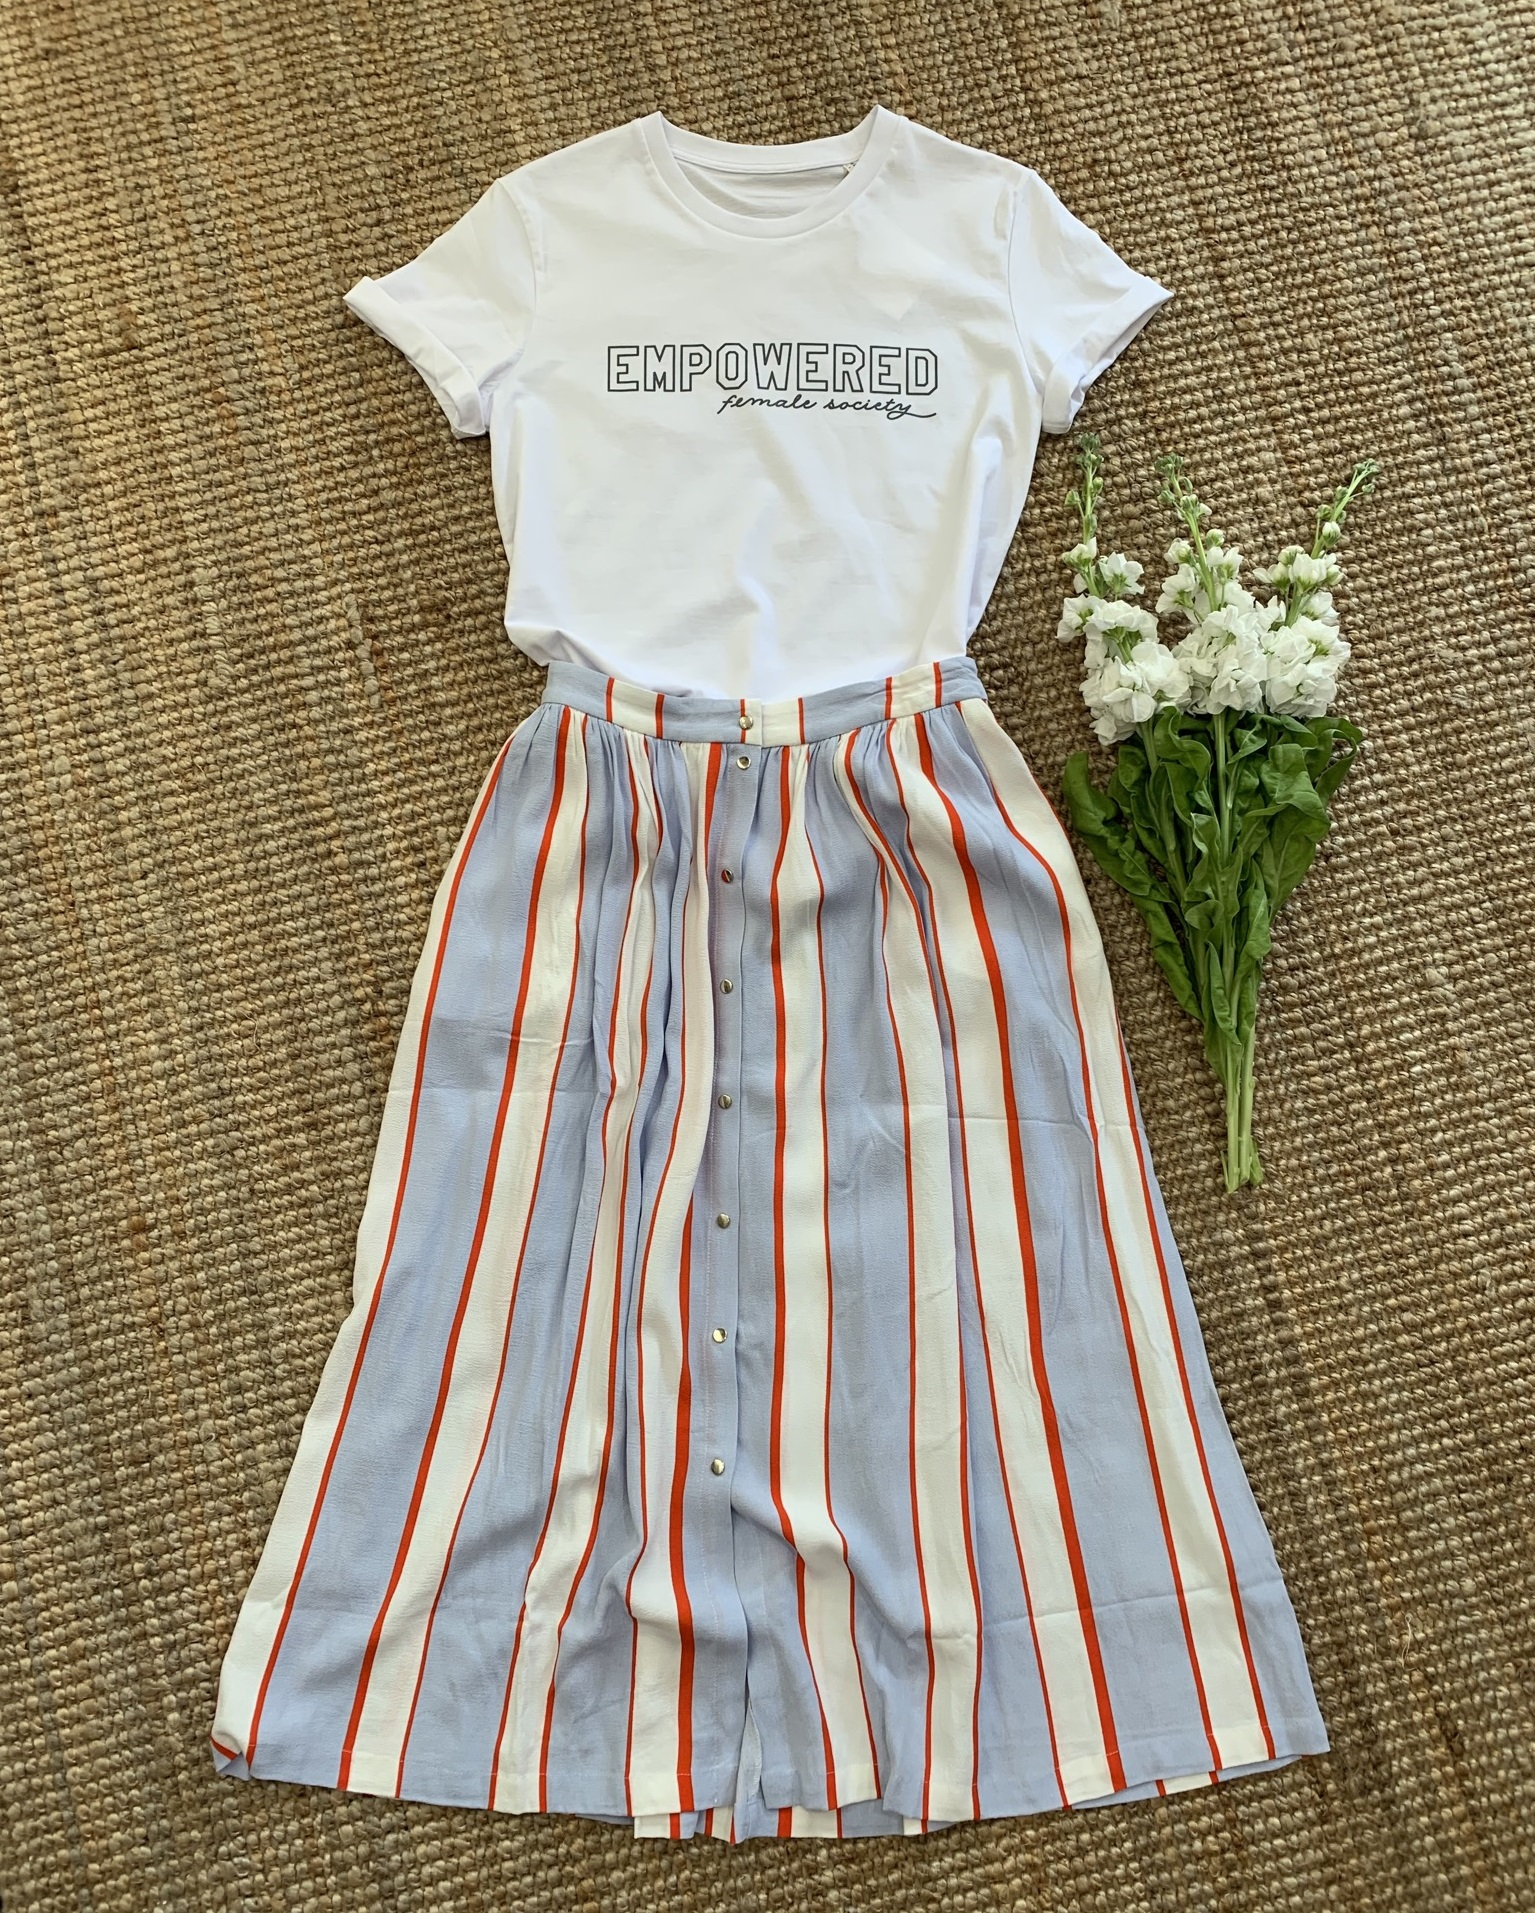 EMPOWERED Female Society T-Shirt White